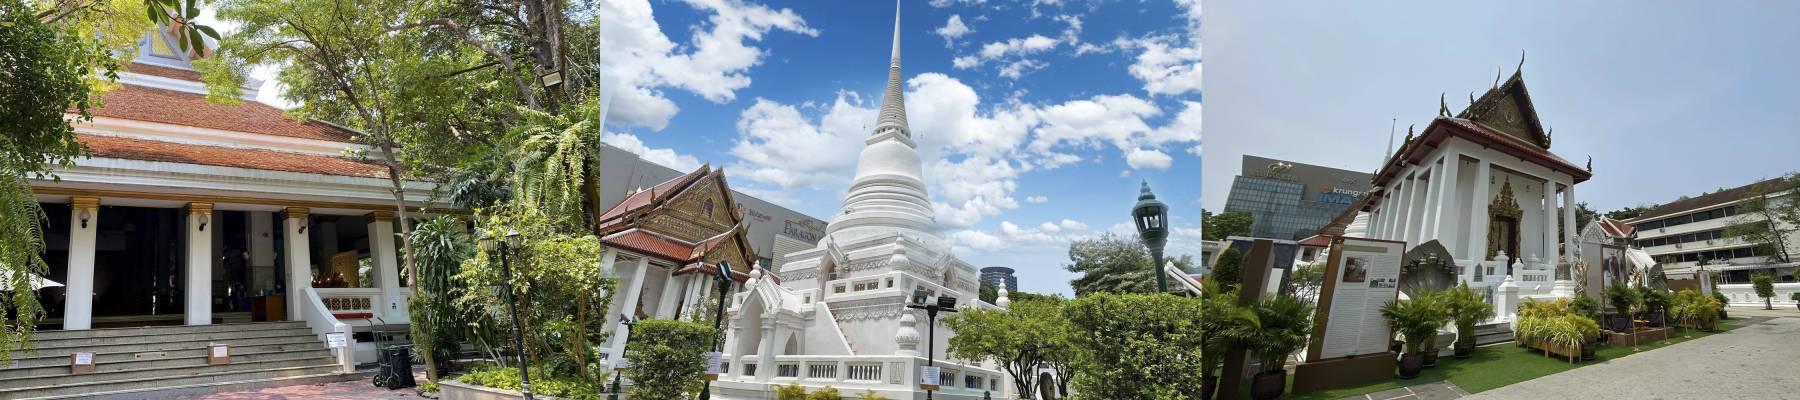 Wat Pathum